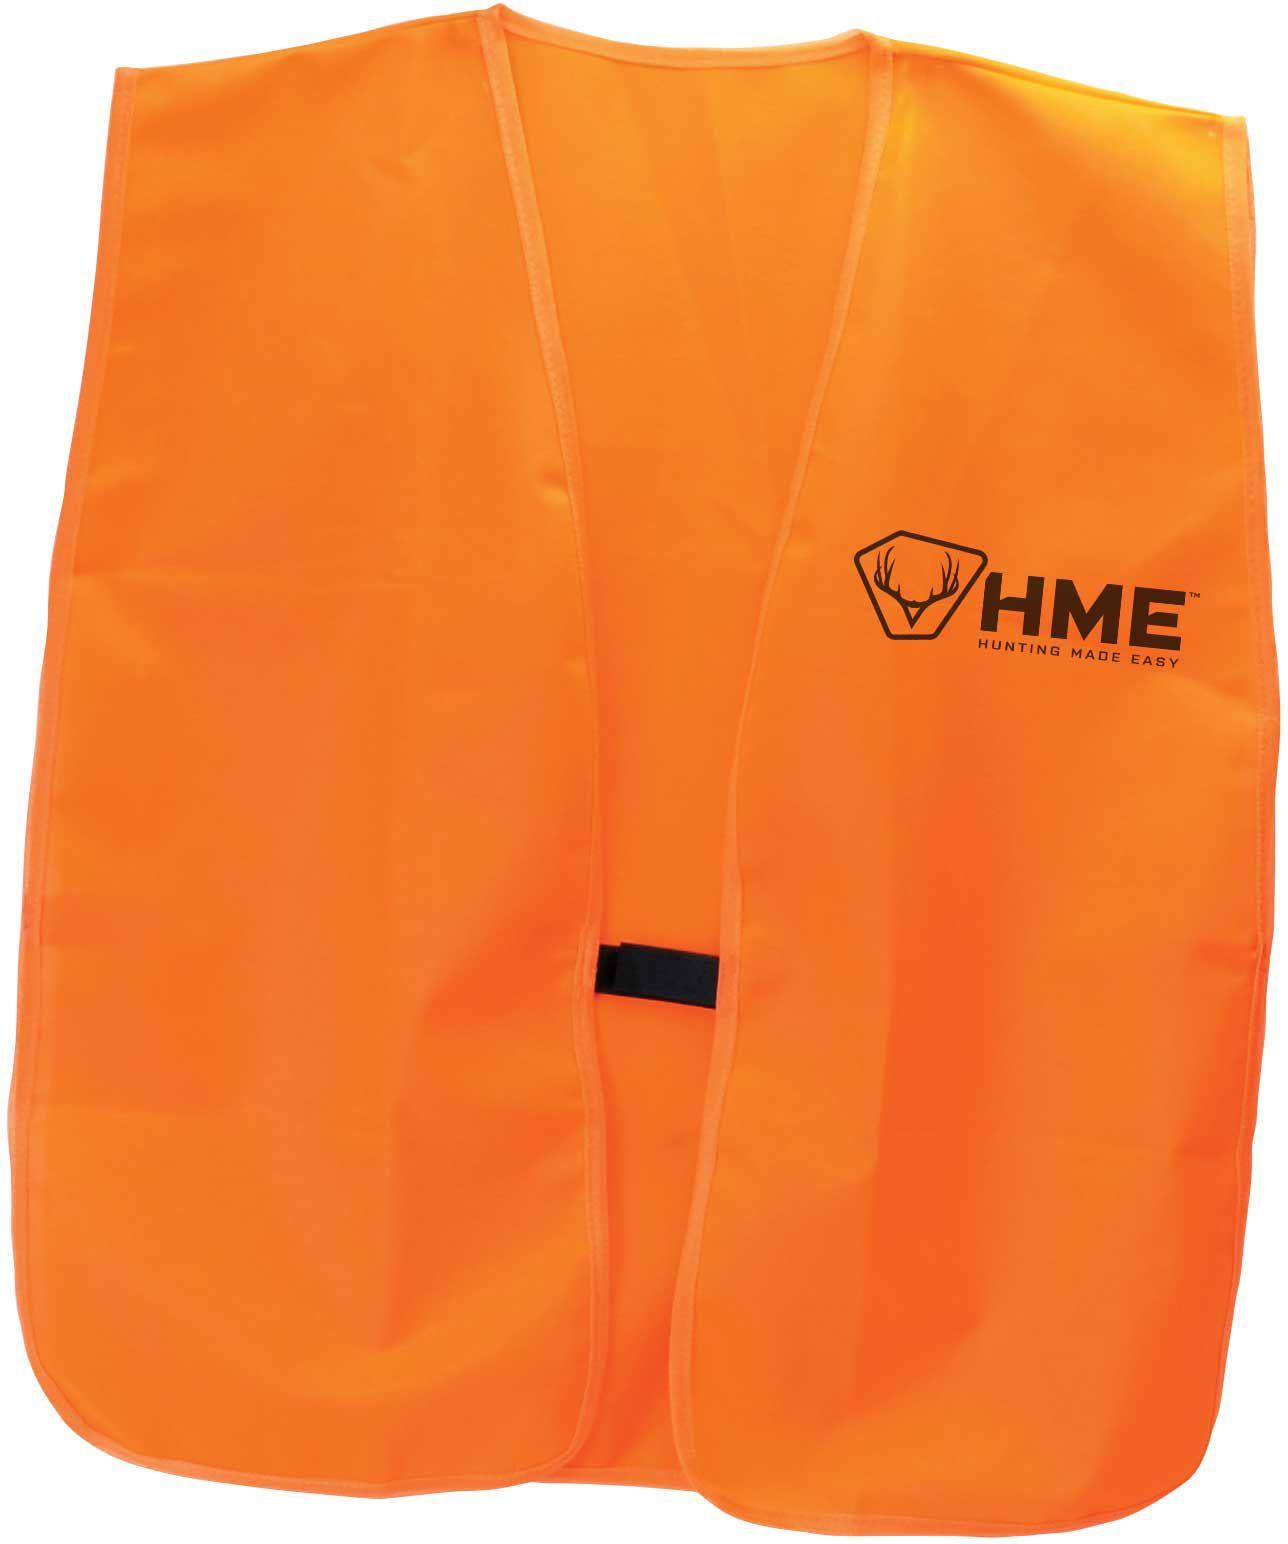 GSM Orange Vest, Men's, Size: One size, Blaze Orange thumbnail